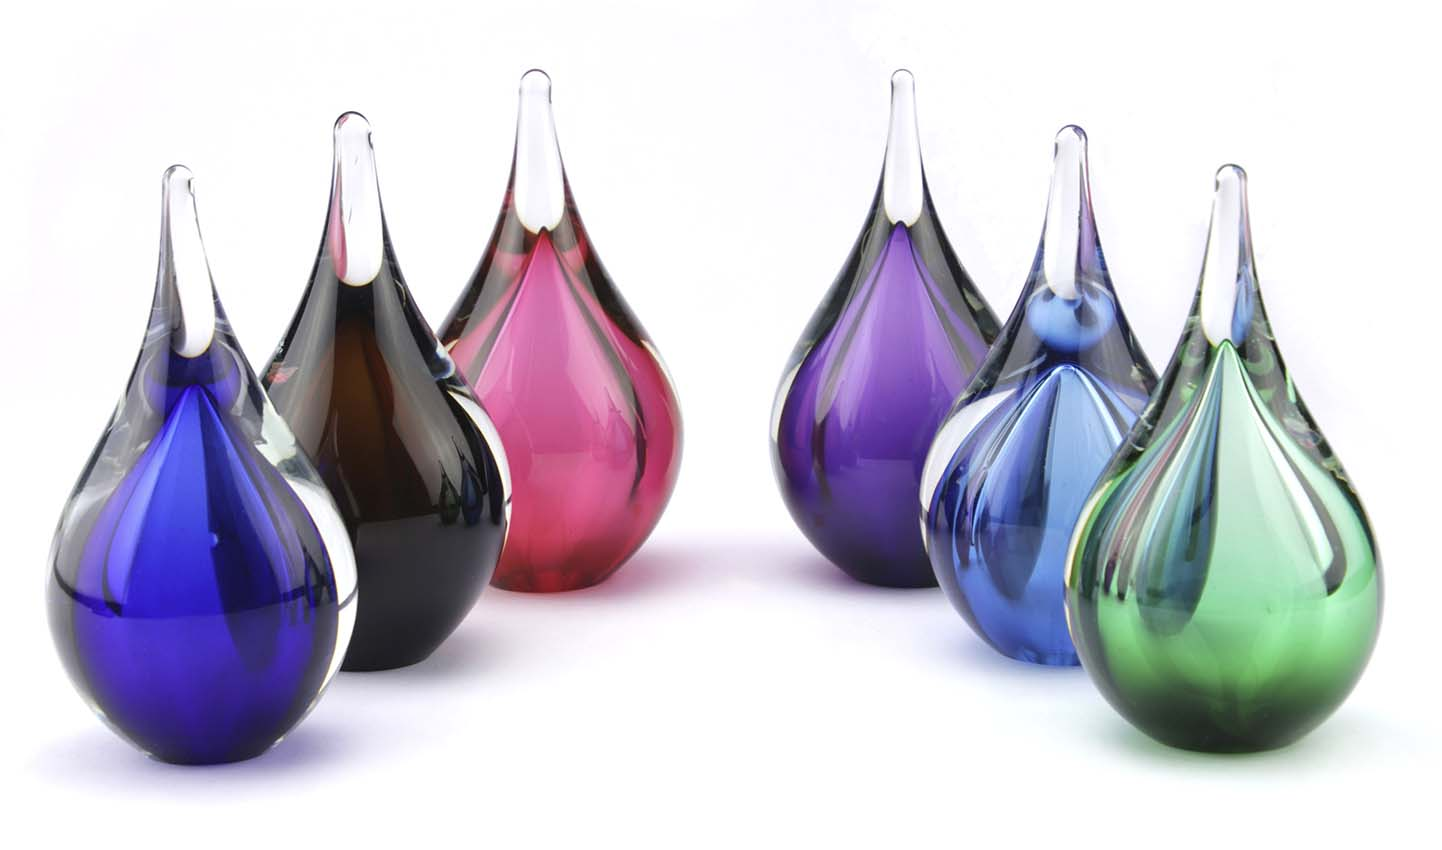 Kristalglazen 3D Mini Traan Urn Roze-Zwart (0.05 liter)